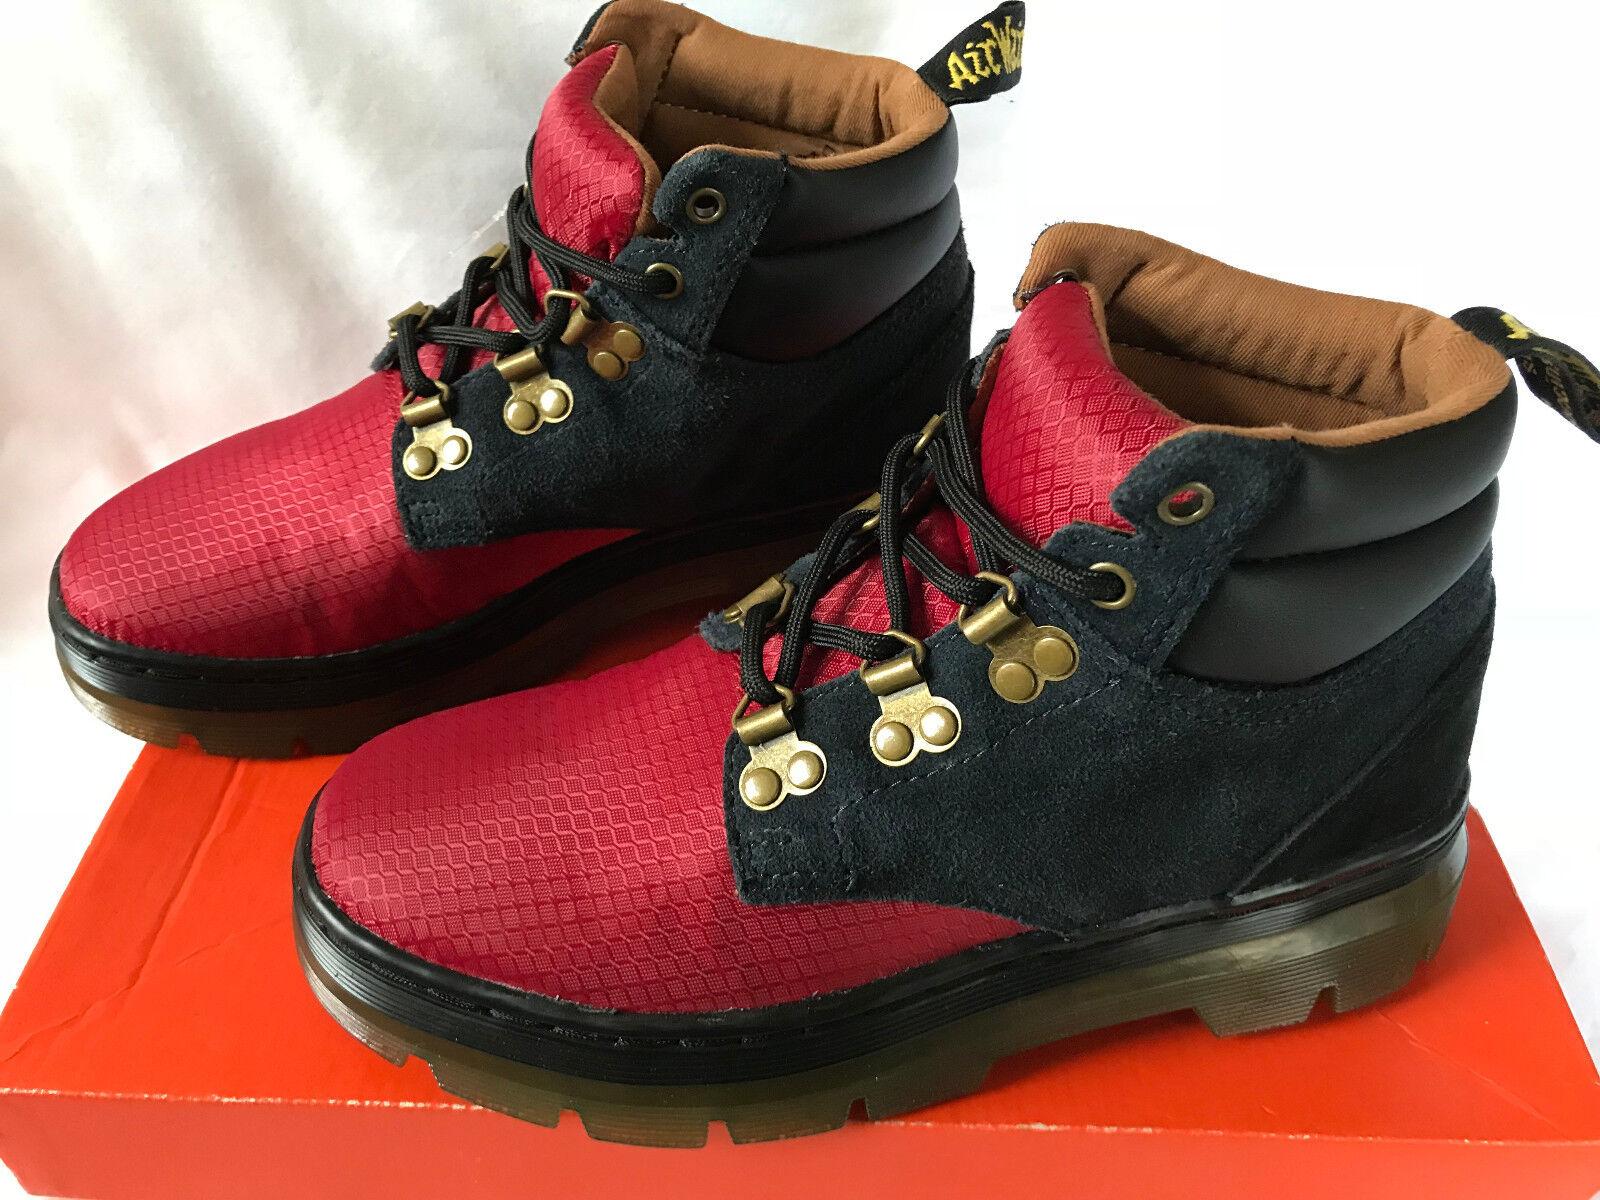 large assortment latest style stylish design Dr. Martens Rakim Hiker Nylon Suede High Top Comfort Shoes Boots Women's 6  new